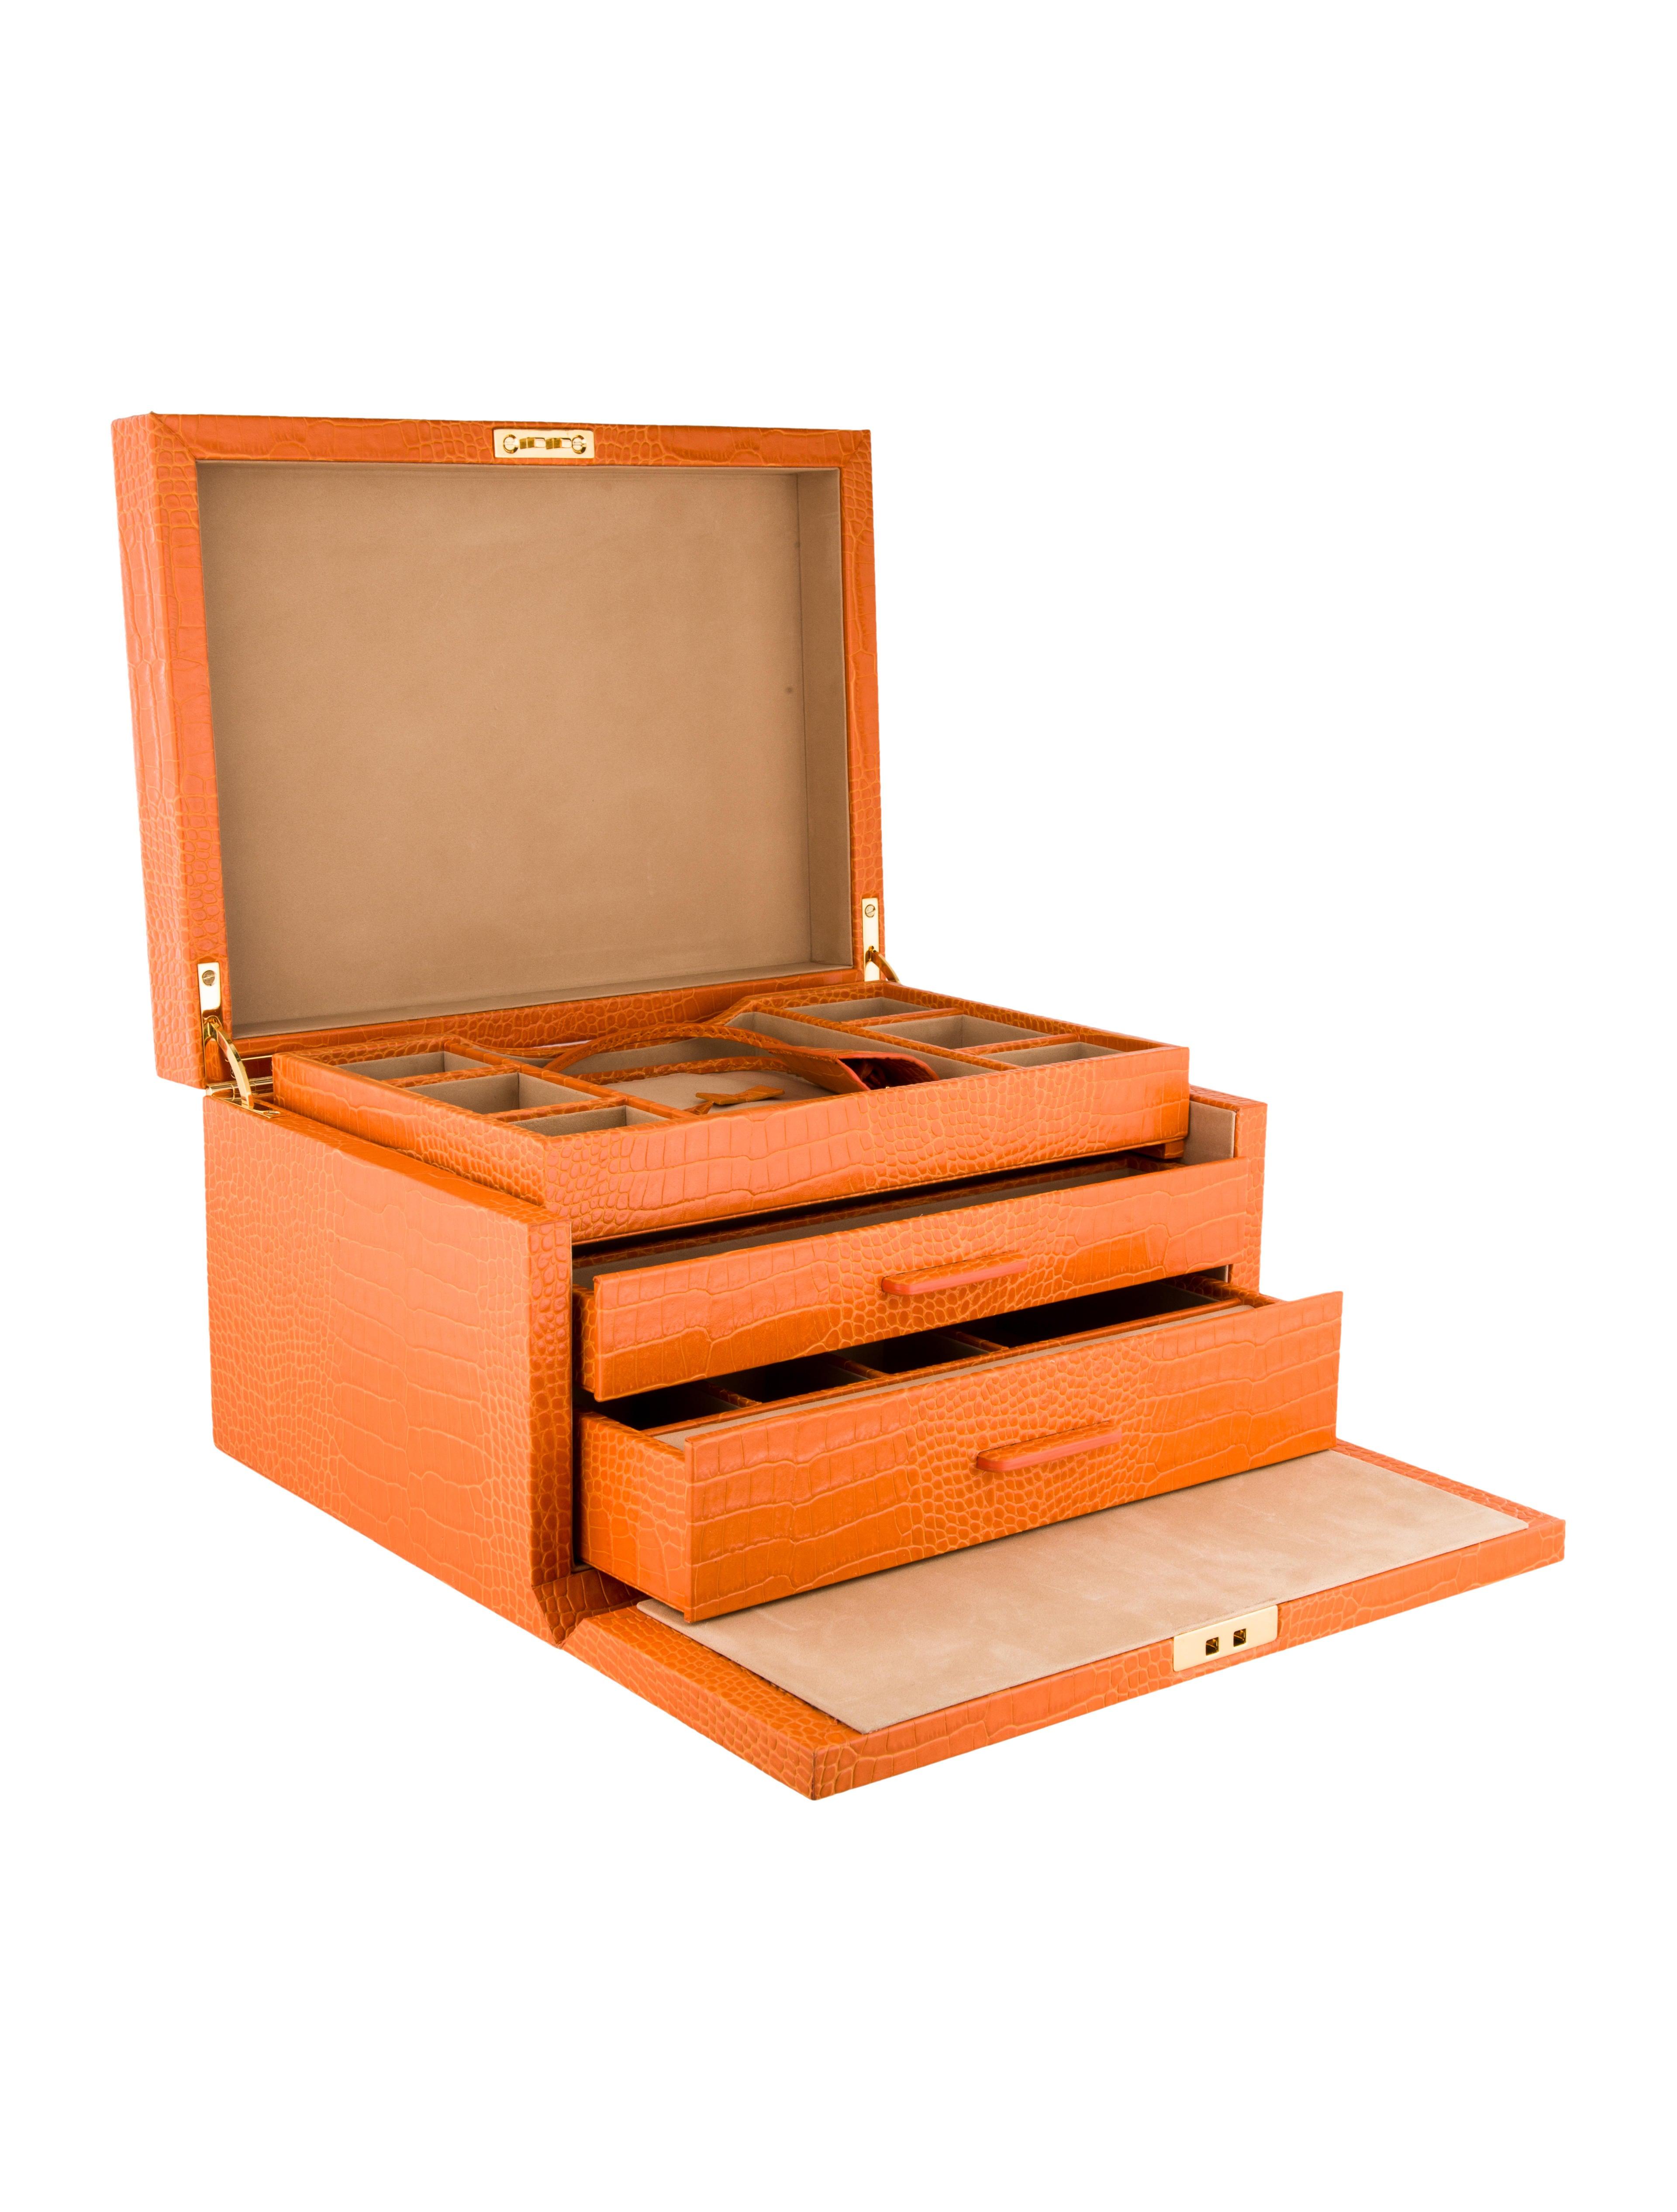 Smythson mara jewelry box decor and accessories for Mara home decorations